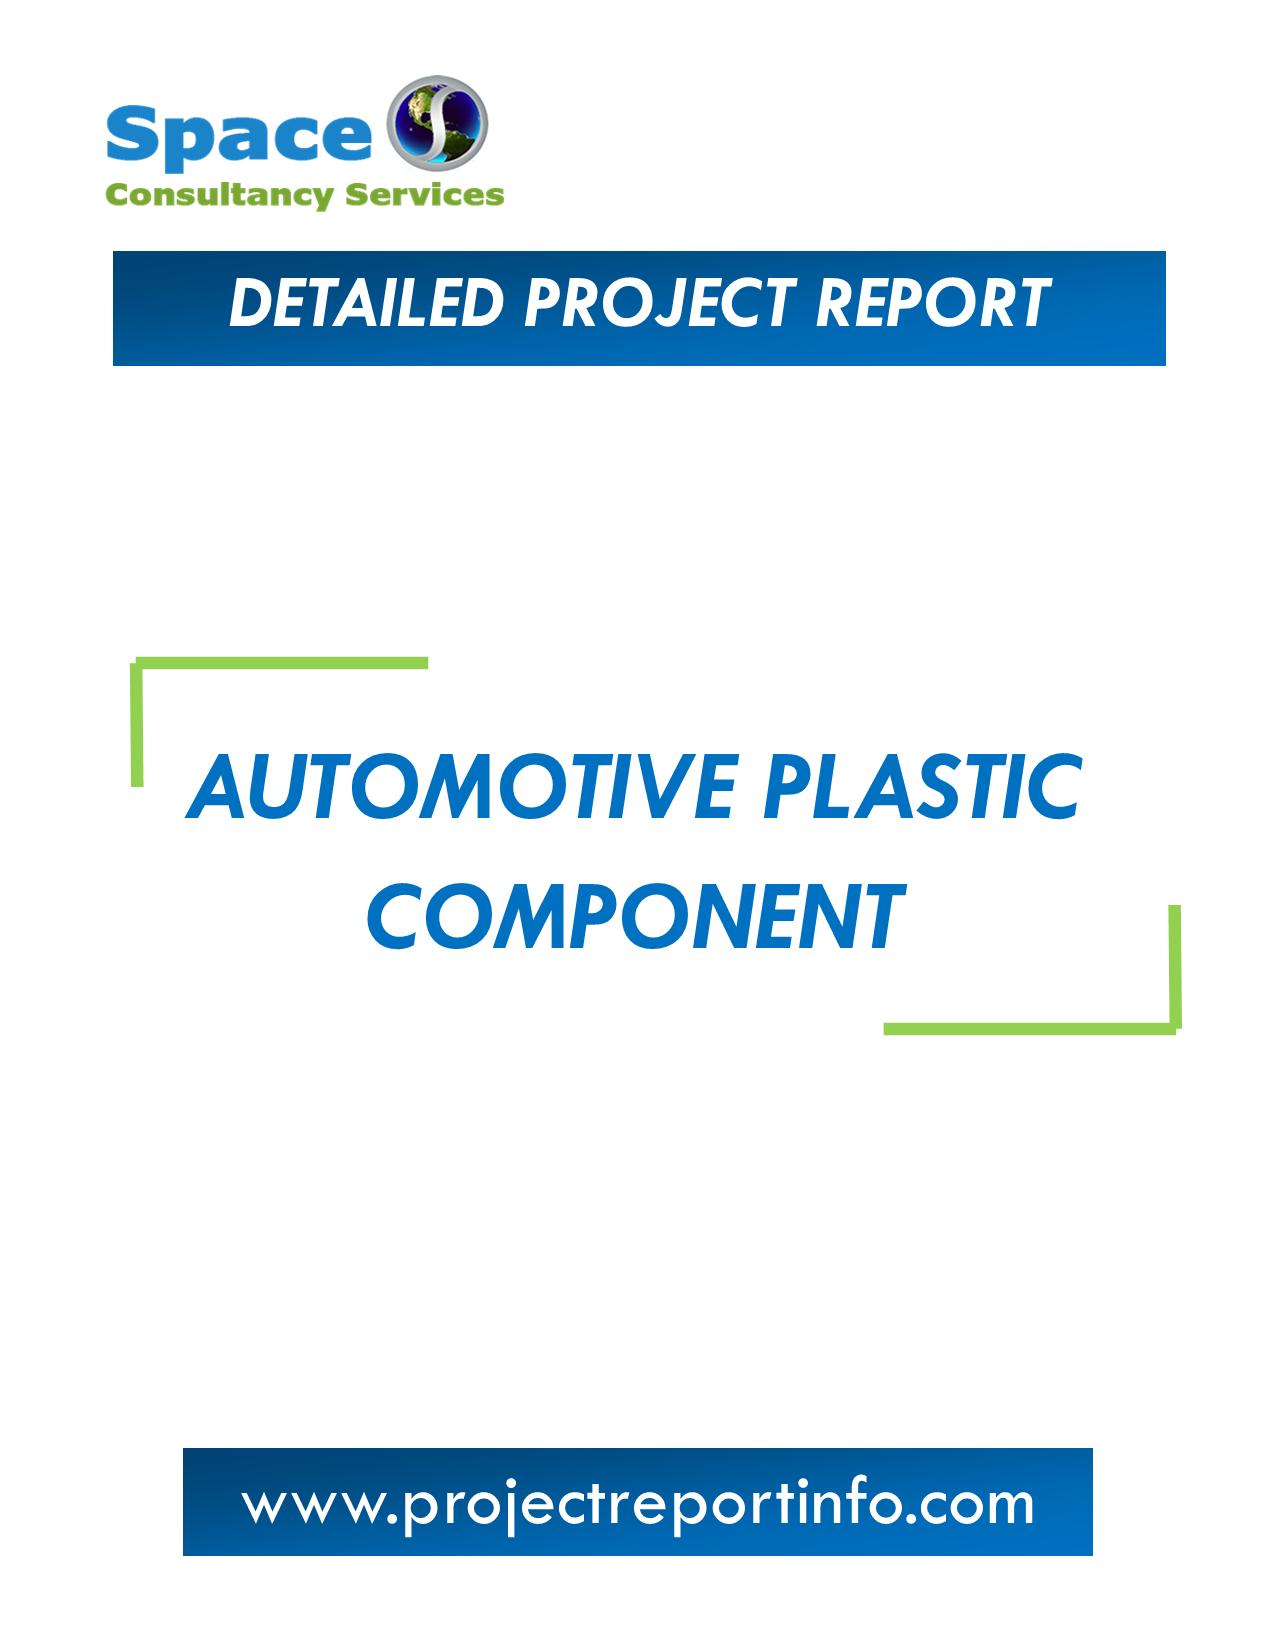 Automotive Plastic Component Manufacturing Project Report